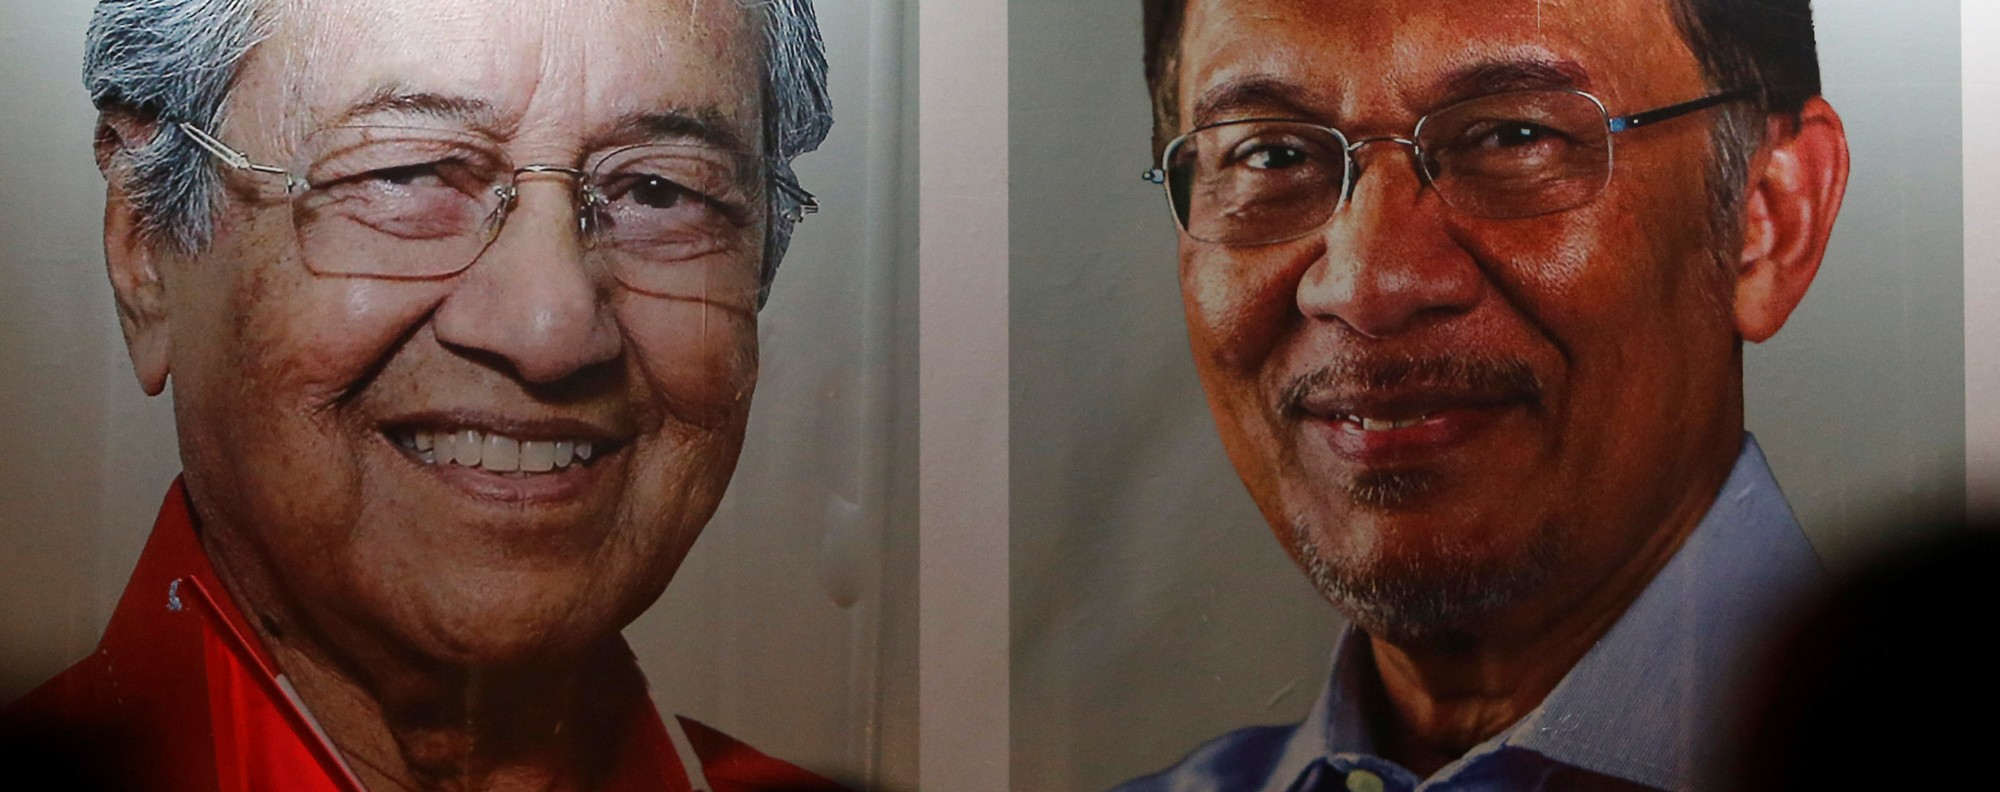 Posters of Mahathir Mohammad and Anwar Ibrahim in Kuala Lumpur. Photo: Reuters